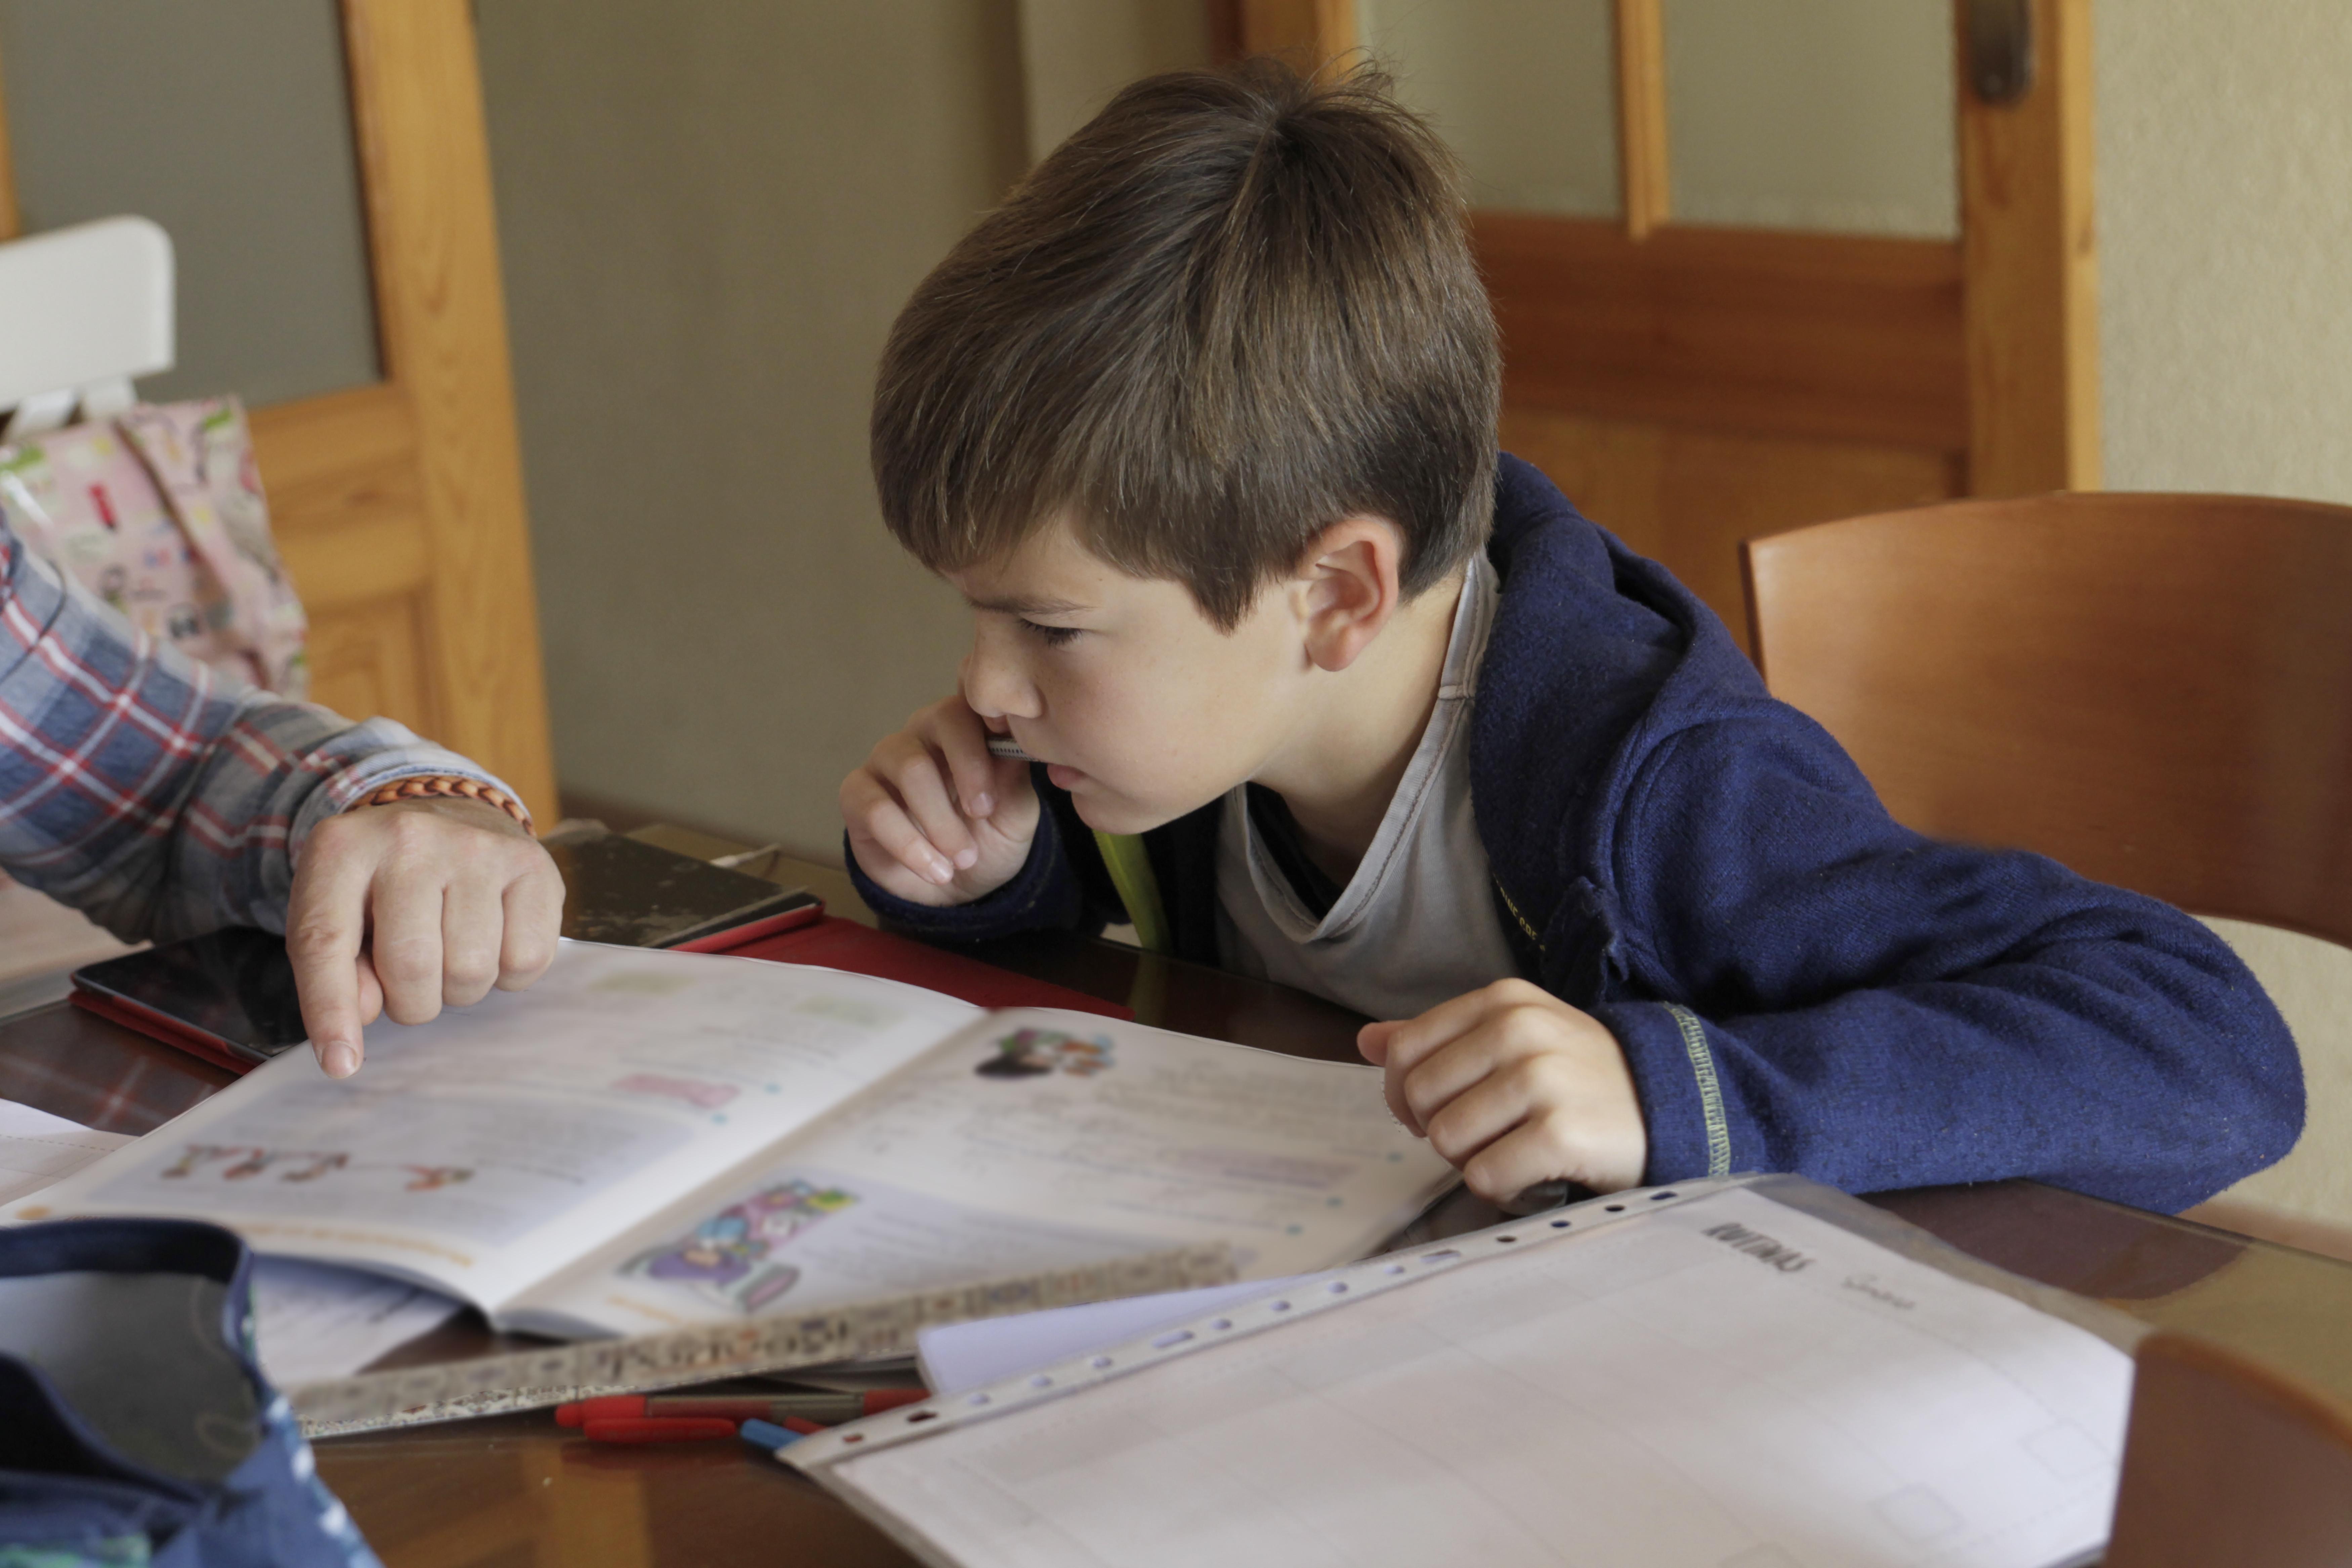 A boy doing school work at a desk.